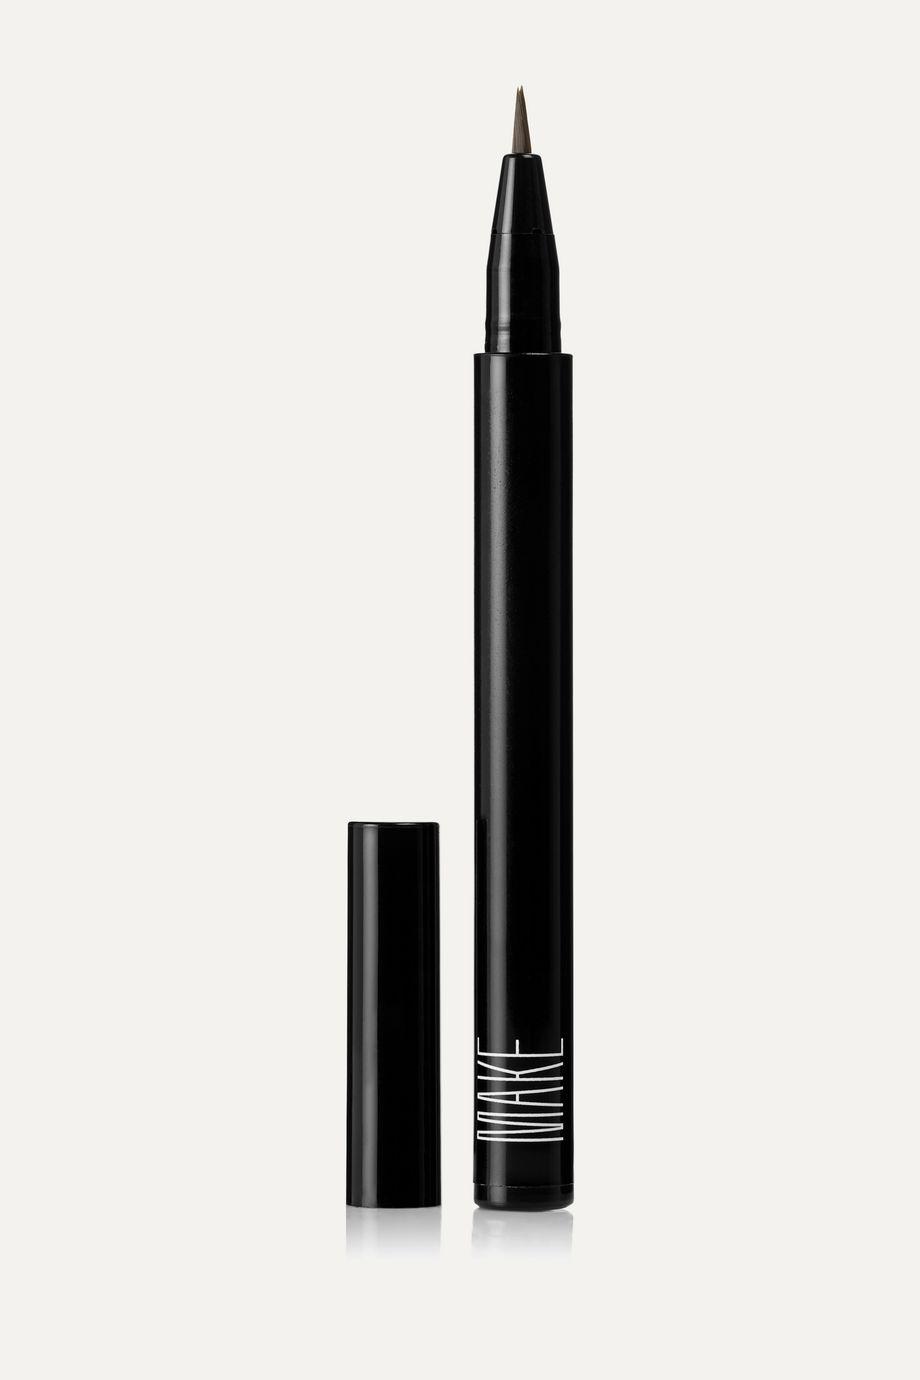 MAKE Beauty Brow Pen - Calm